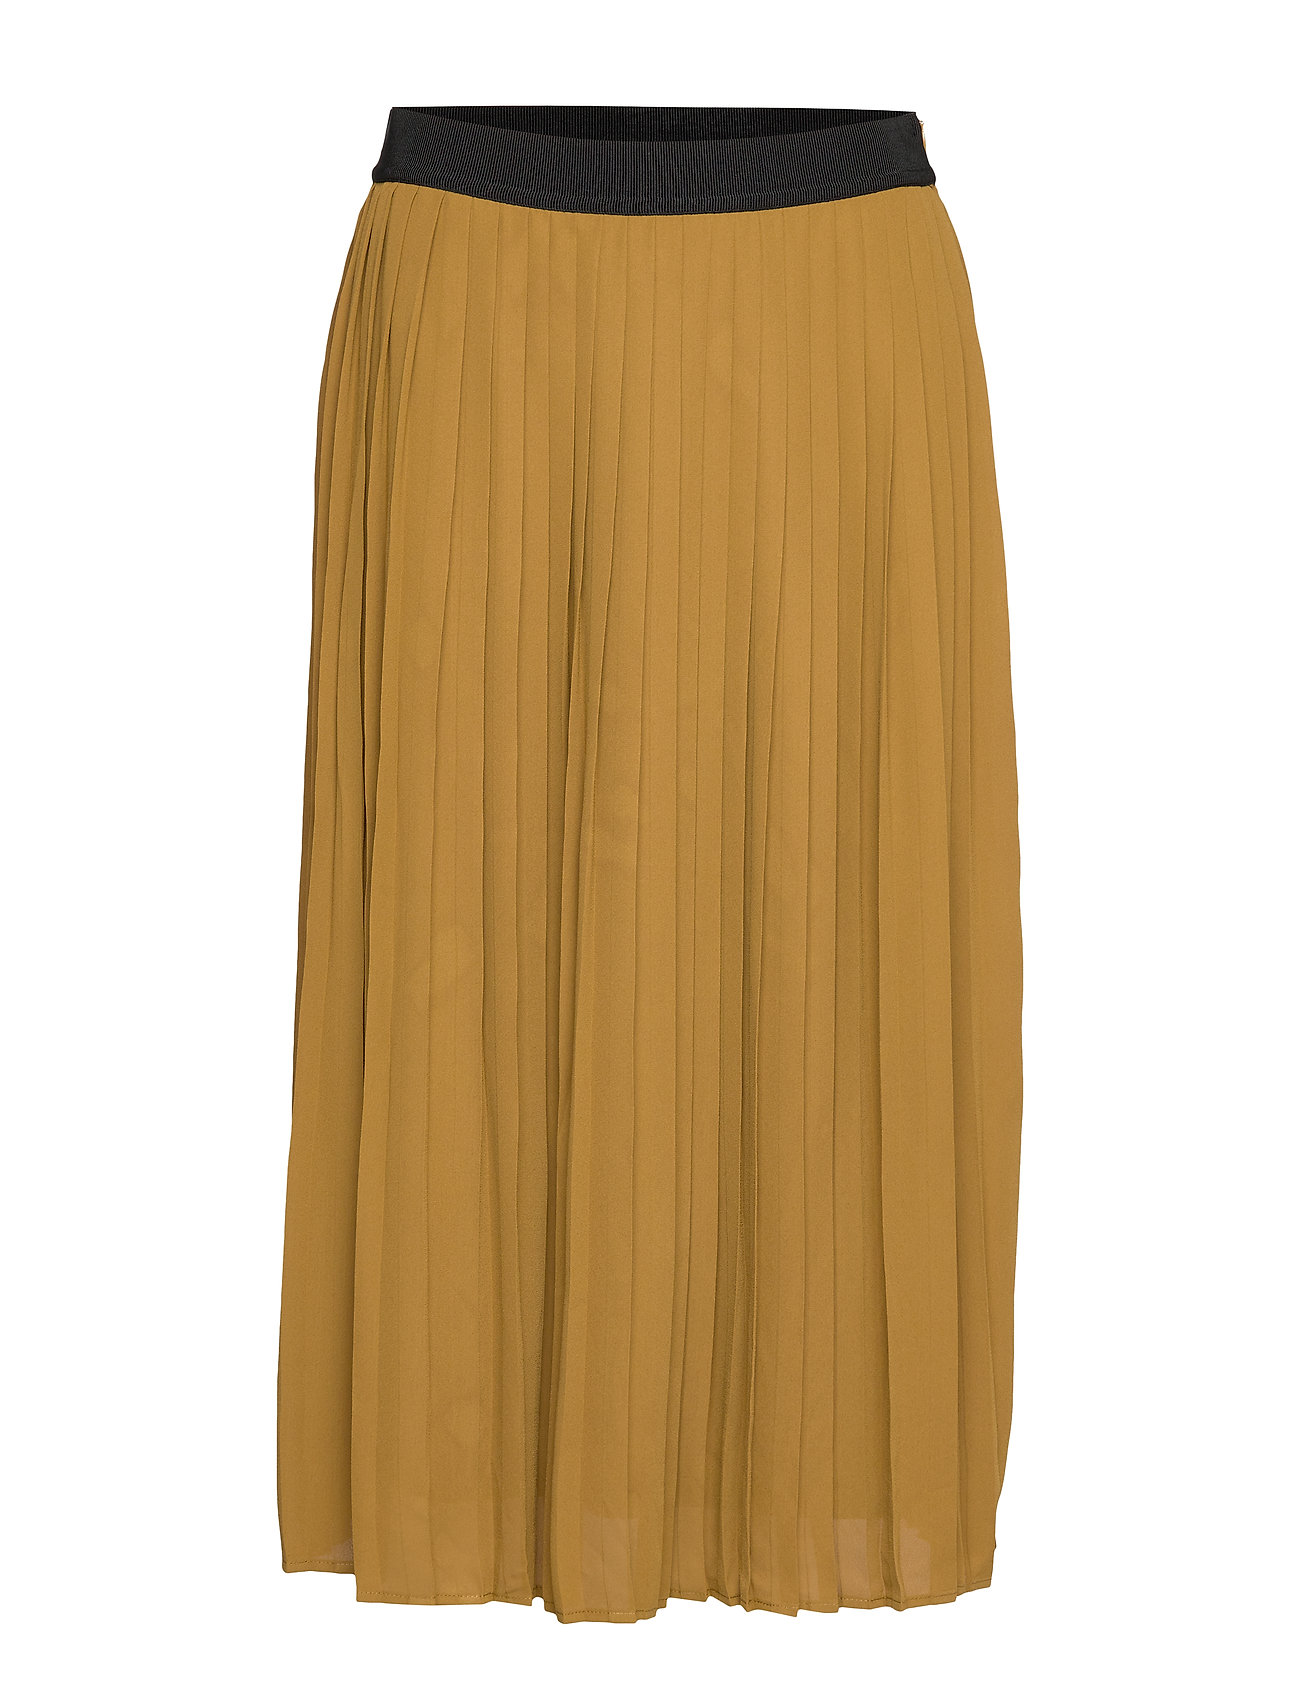 Masai Sunny skirt - GINGER